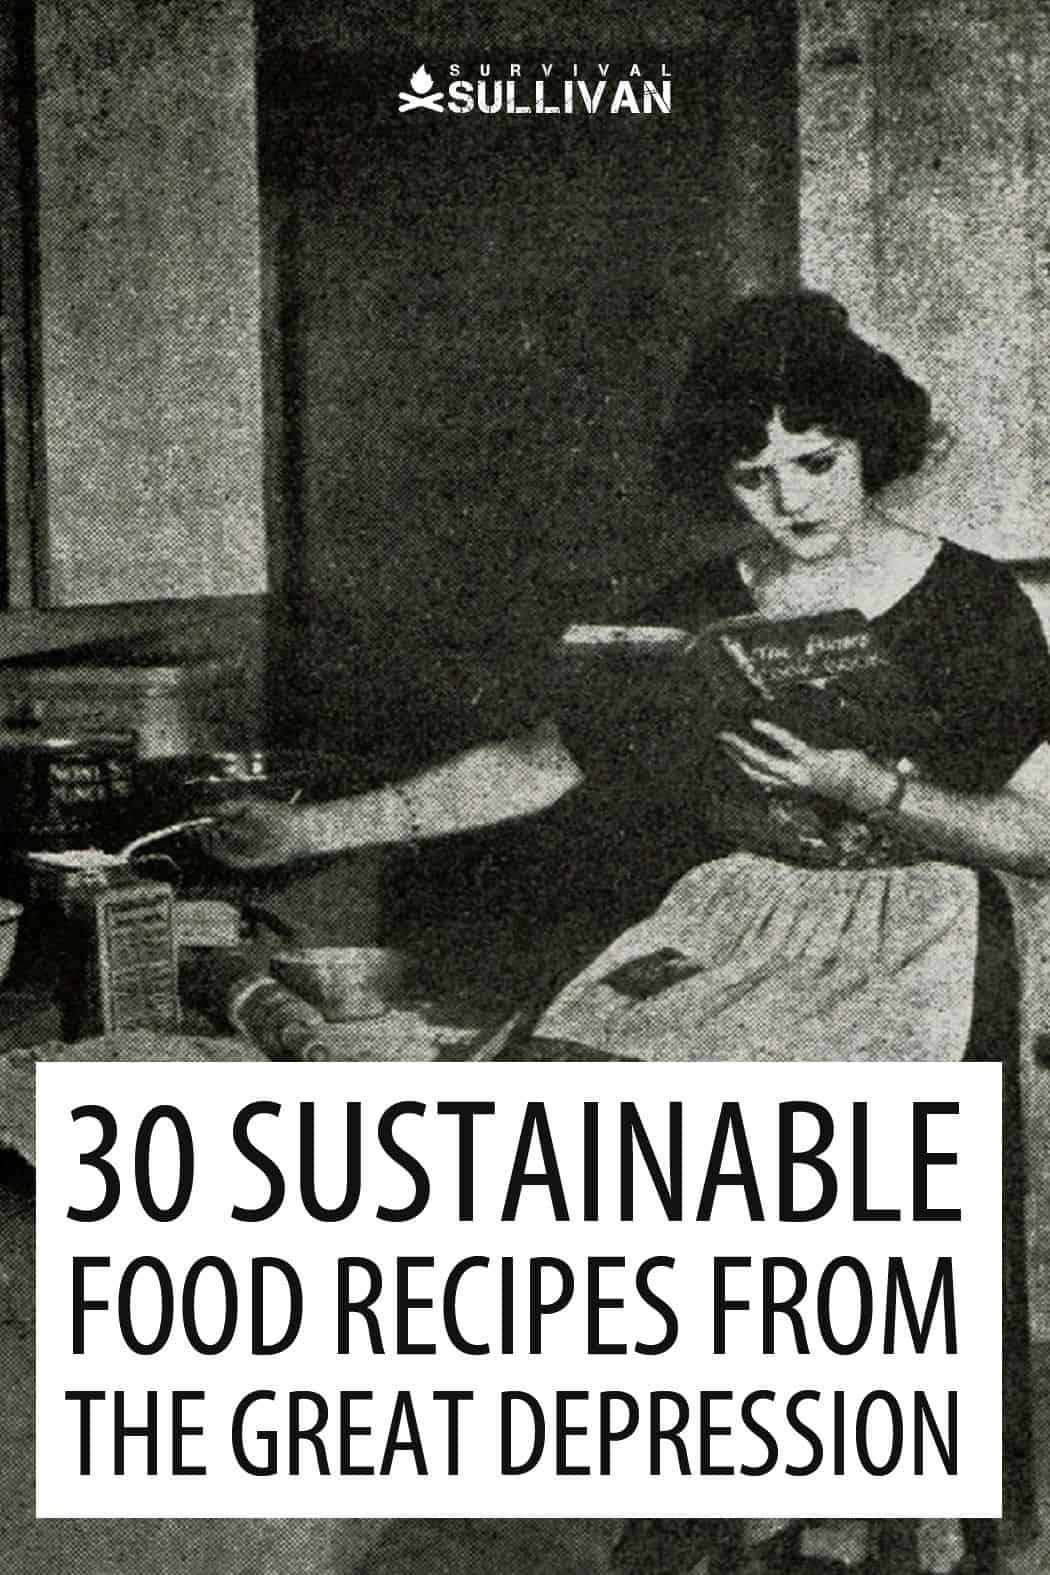 Great Depression recipes Pinterest image